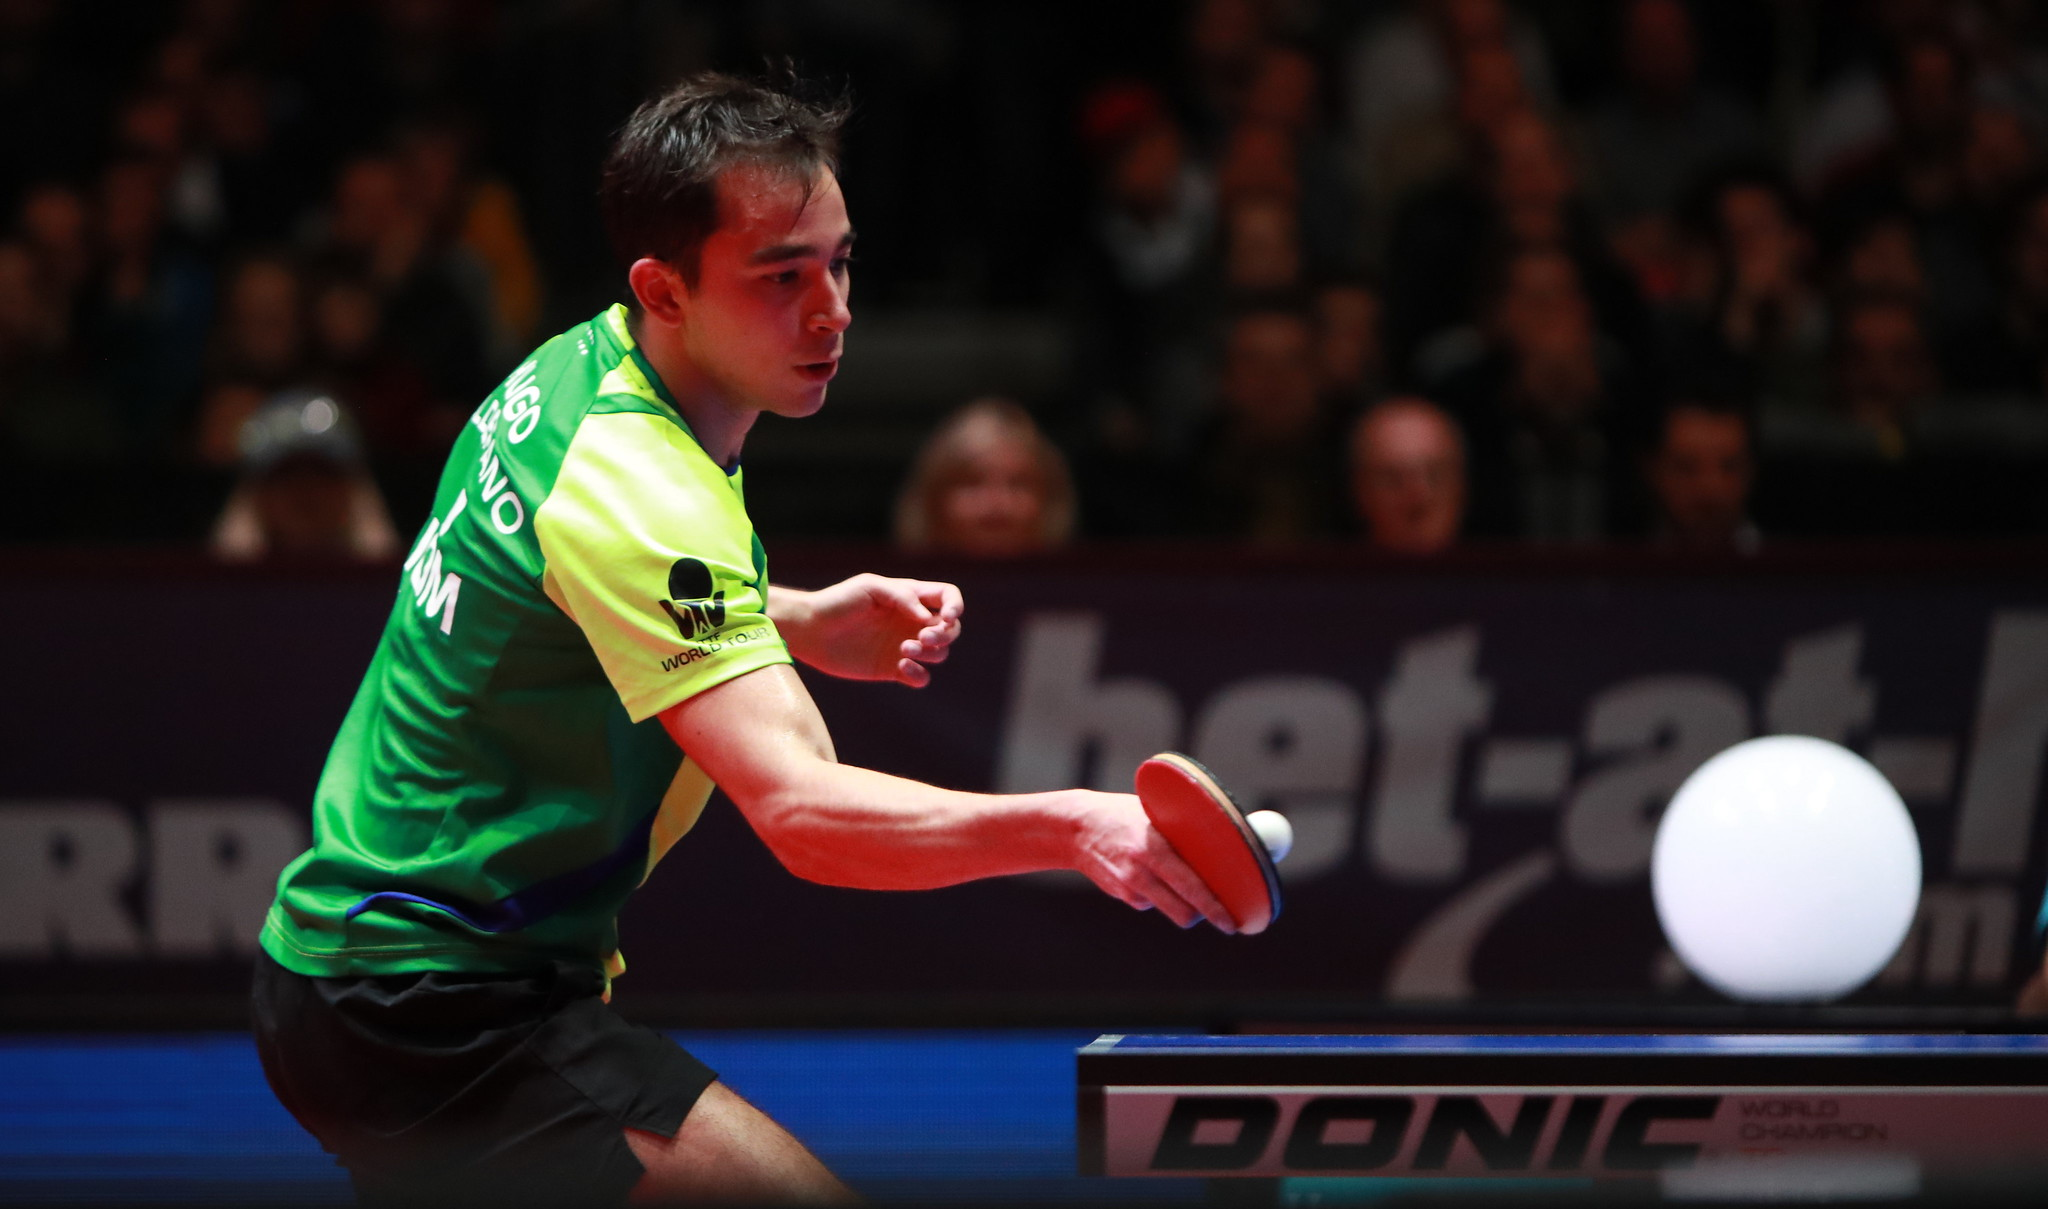 Hugo Calderano estreará na Copa do Mundo já nas oitavas de final (Crédito: ITTF)